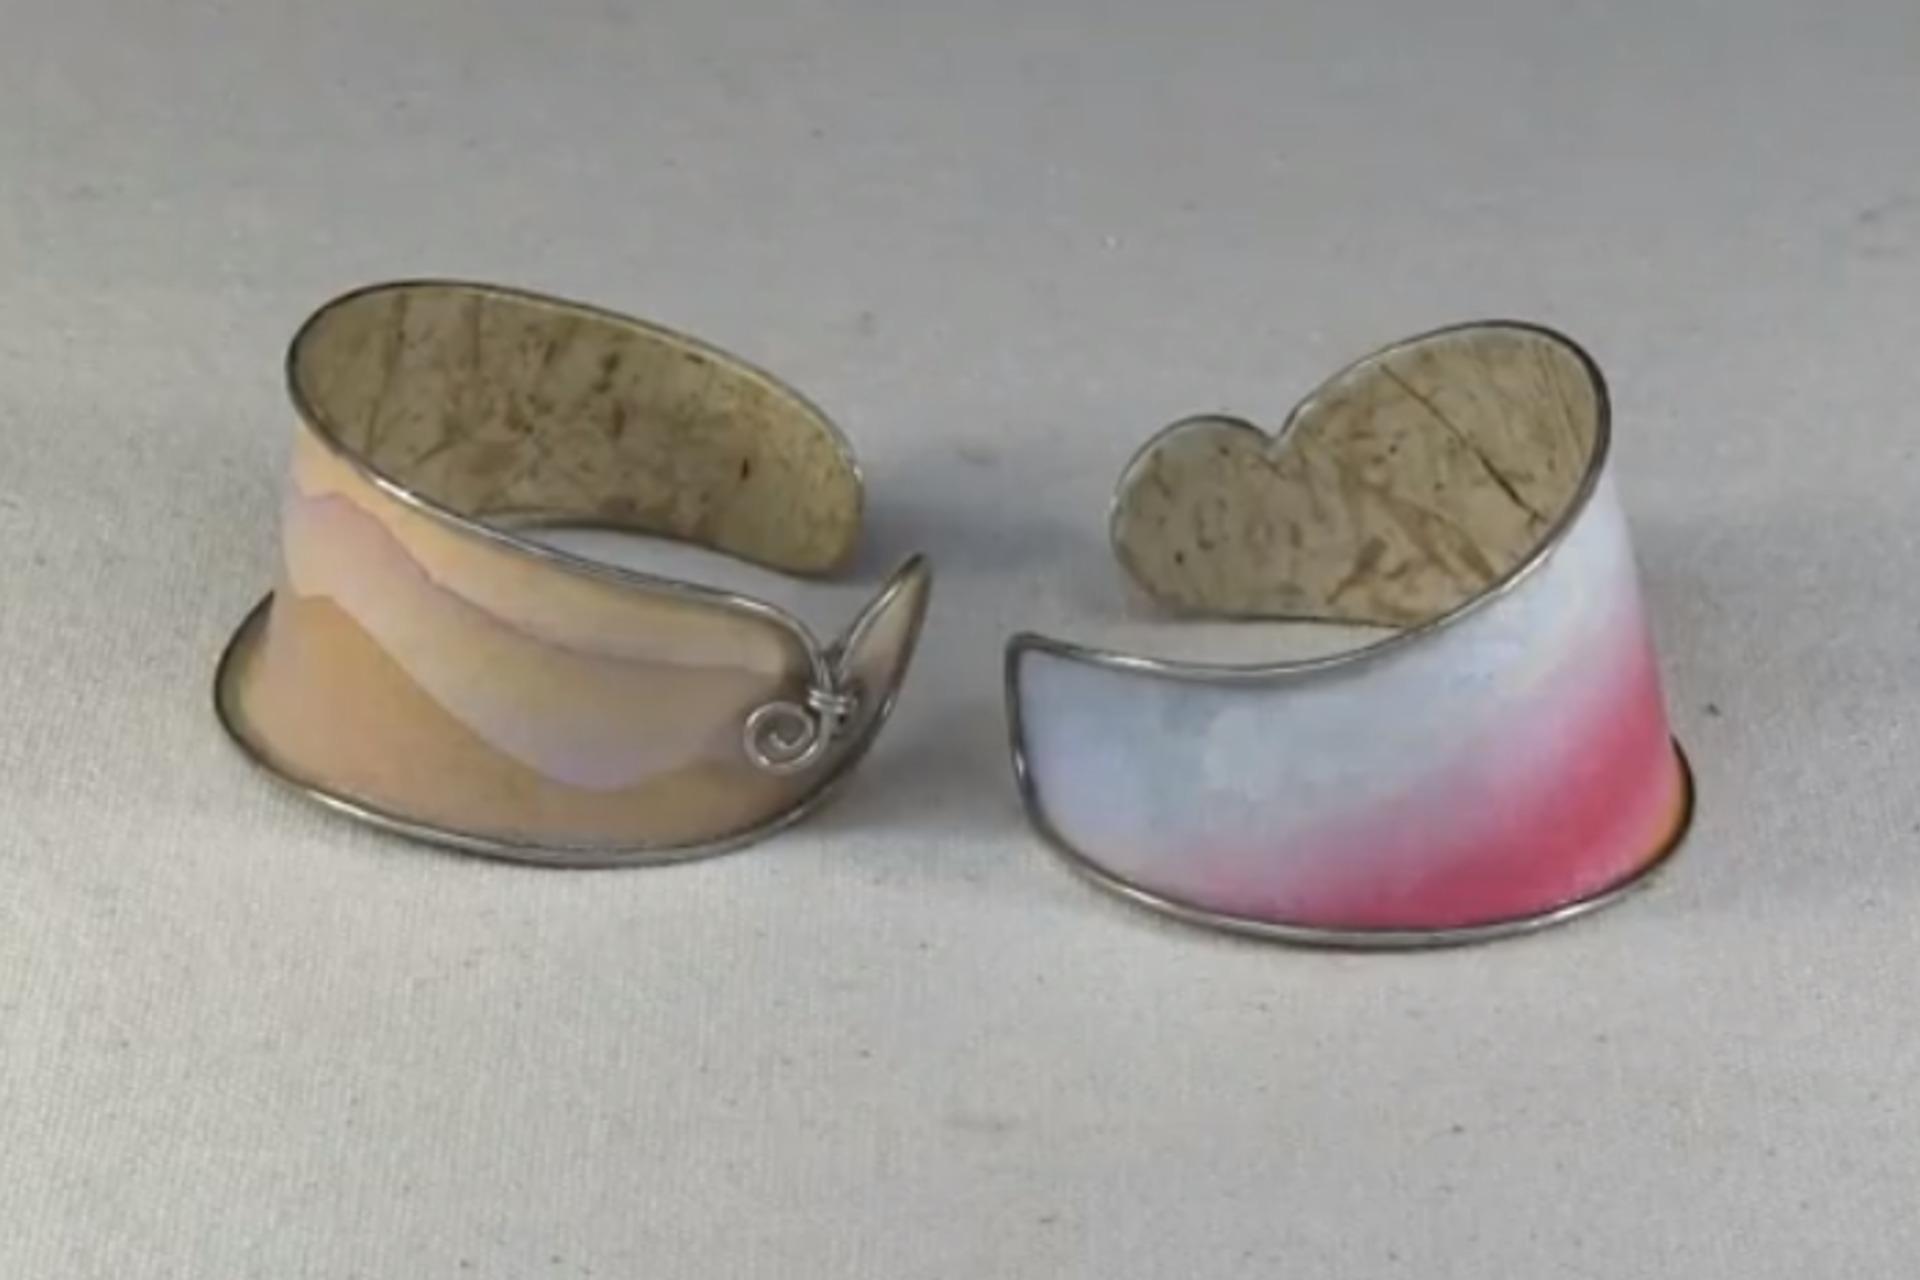 Fashion Jewelry from Wire - DIY